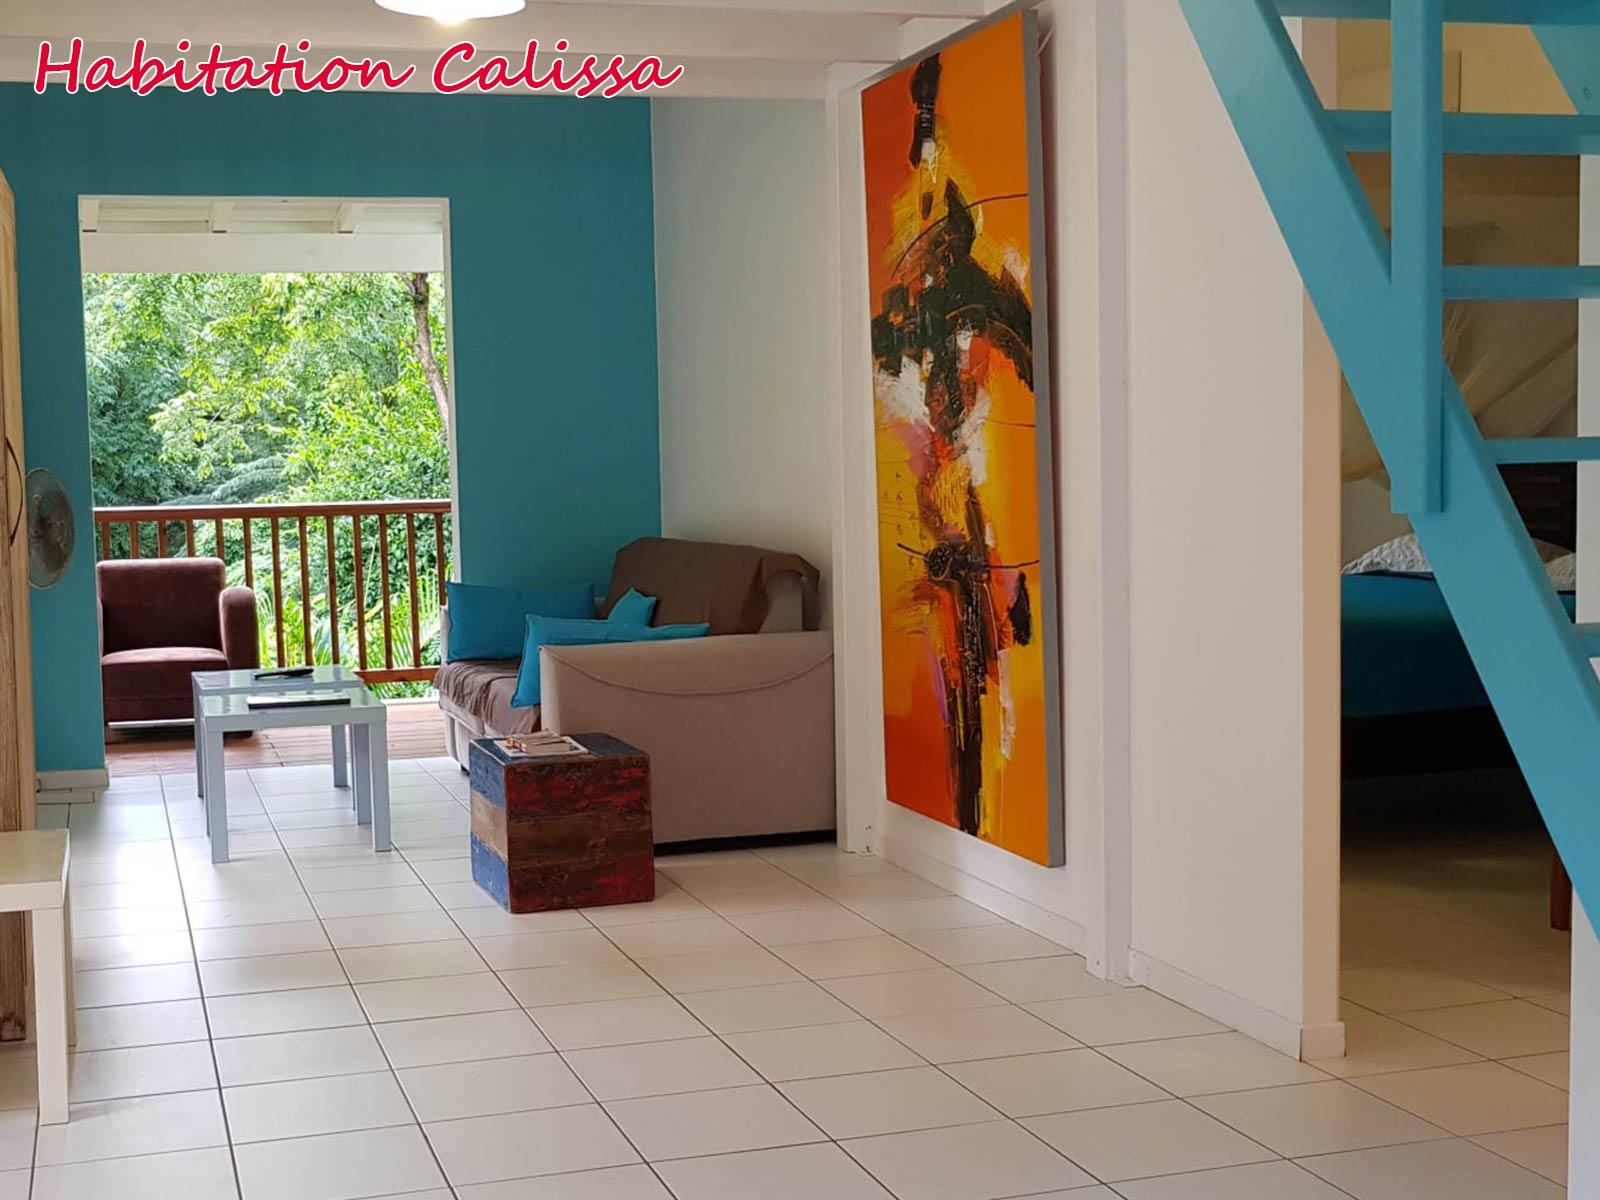 Habitation Calissa - Salon intime